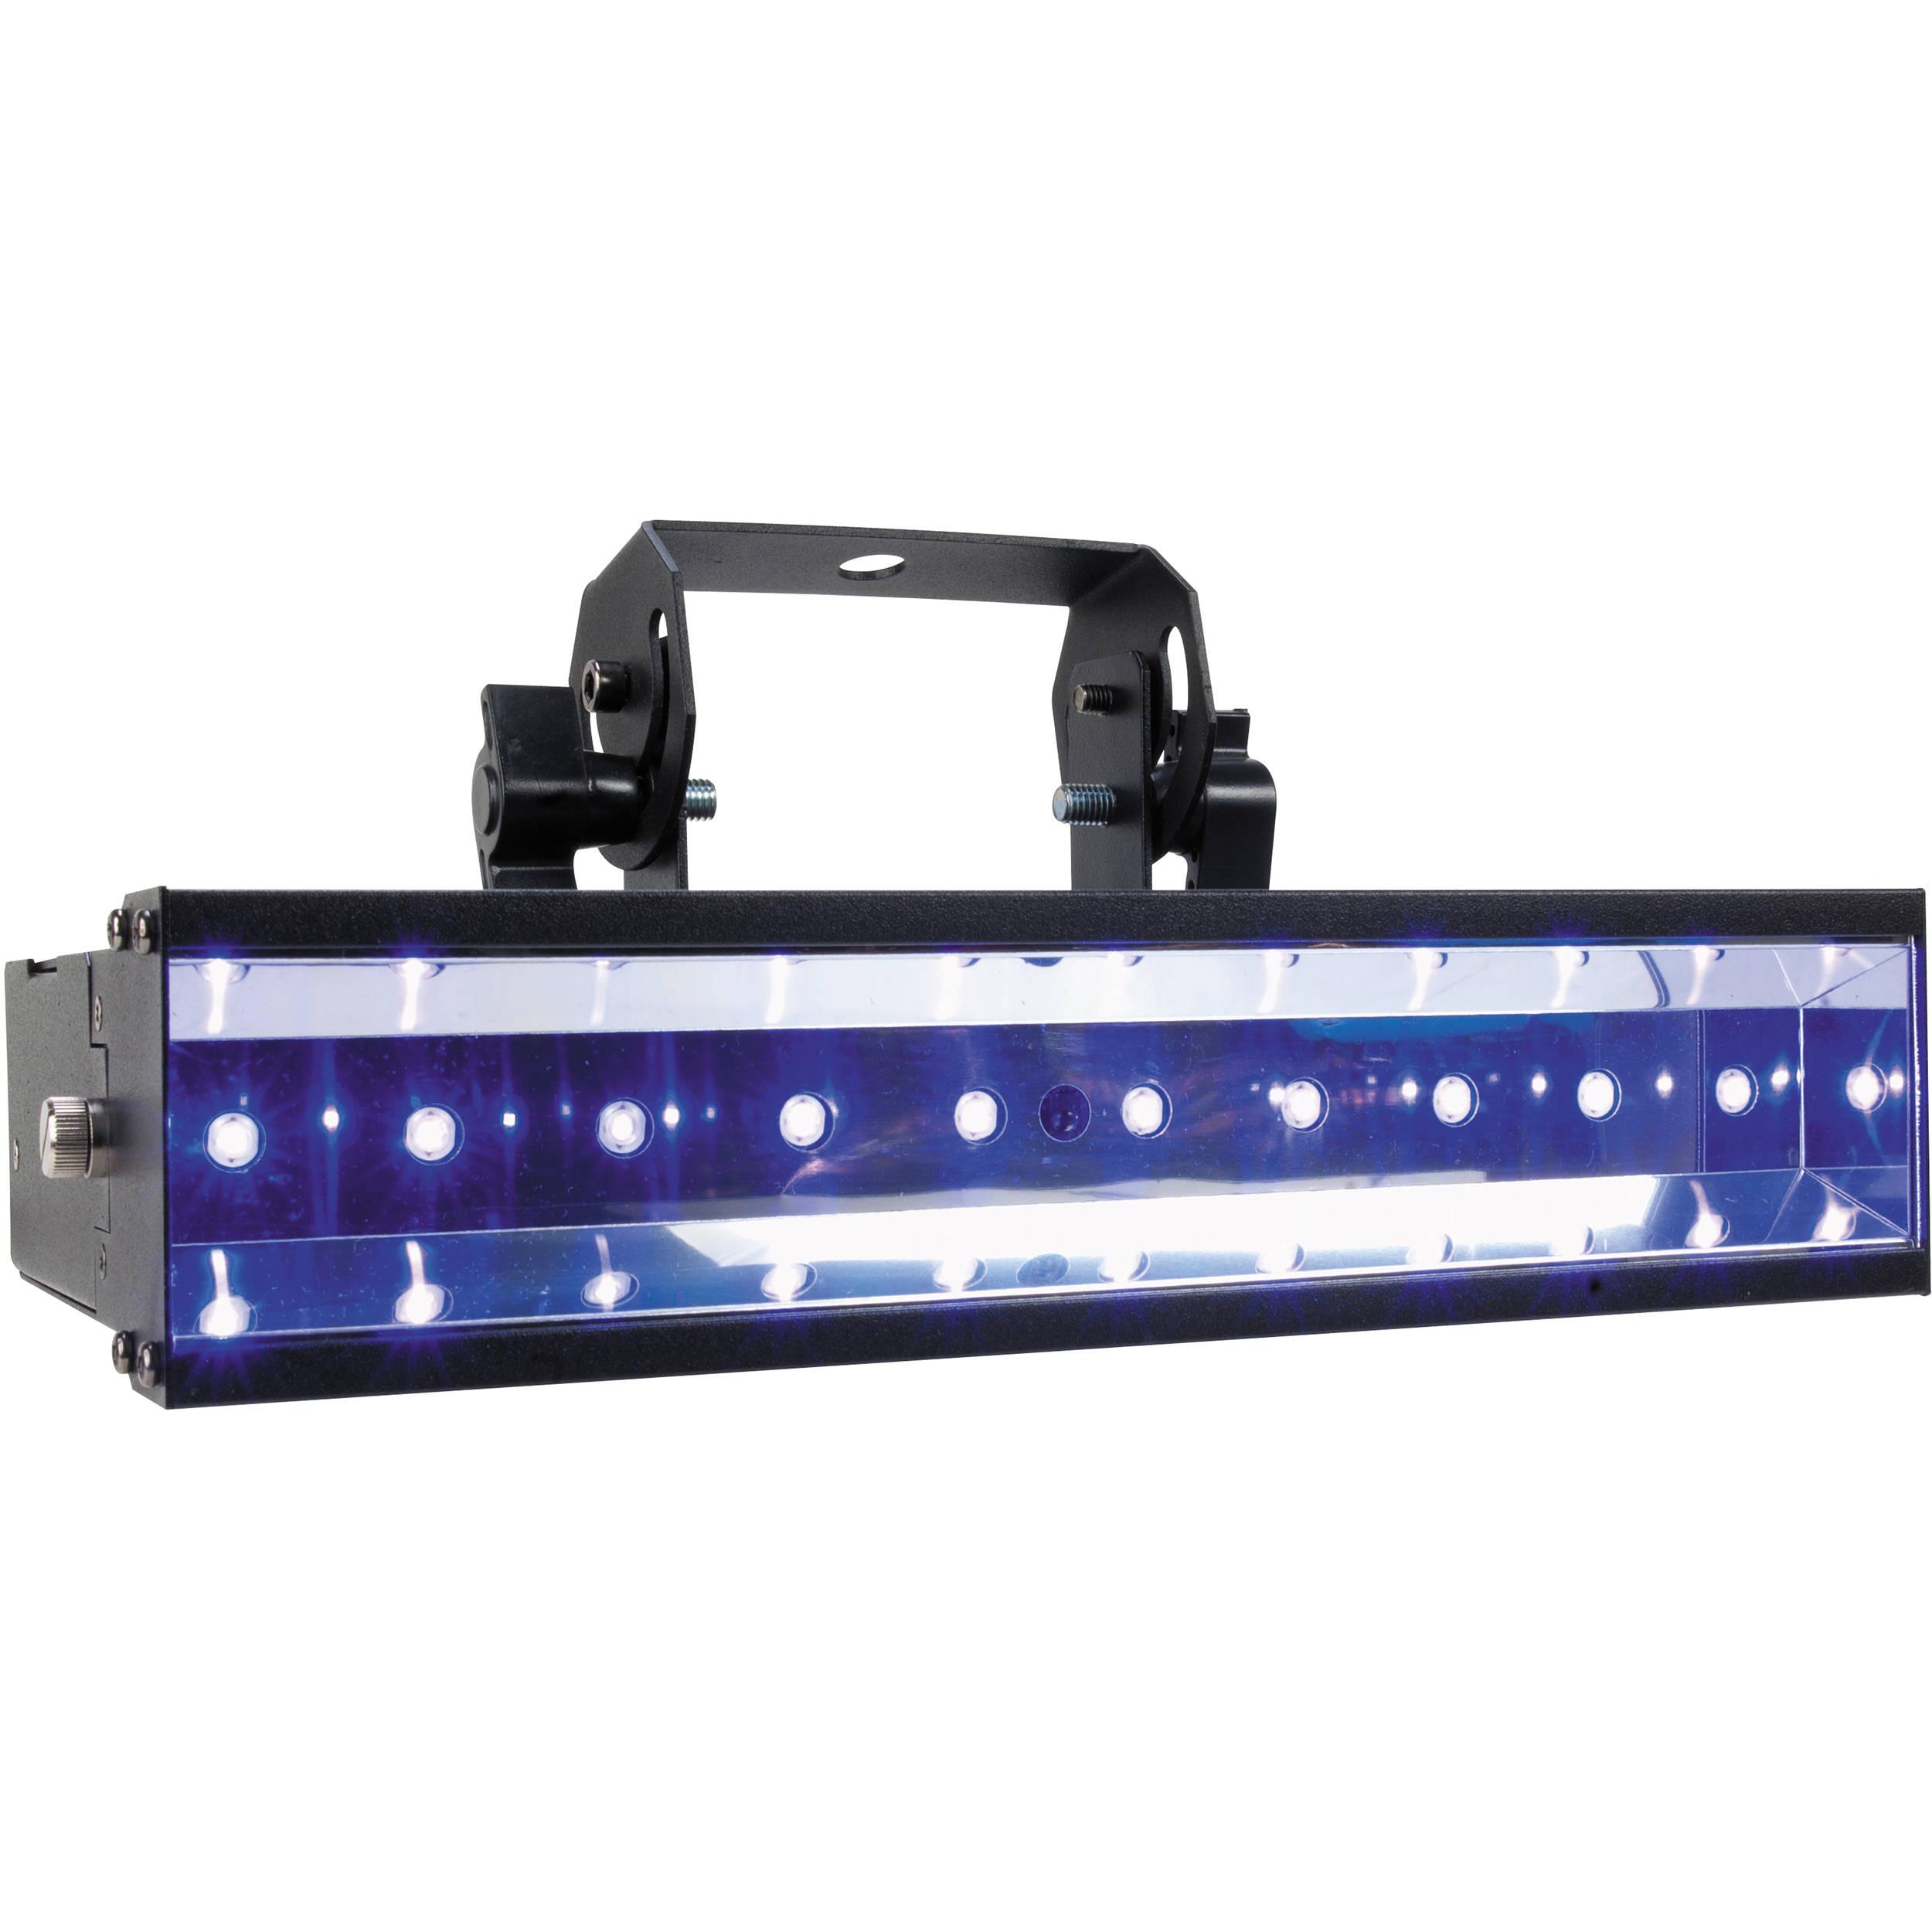 hi led res spotlight p control wireless remote light go mount lighting magnetic handheld golight white image stryker